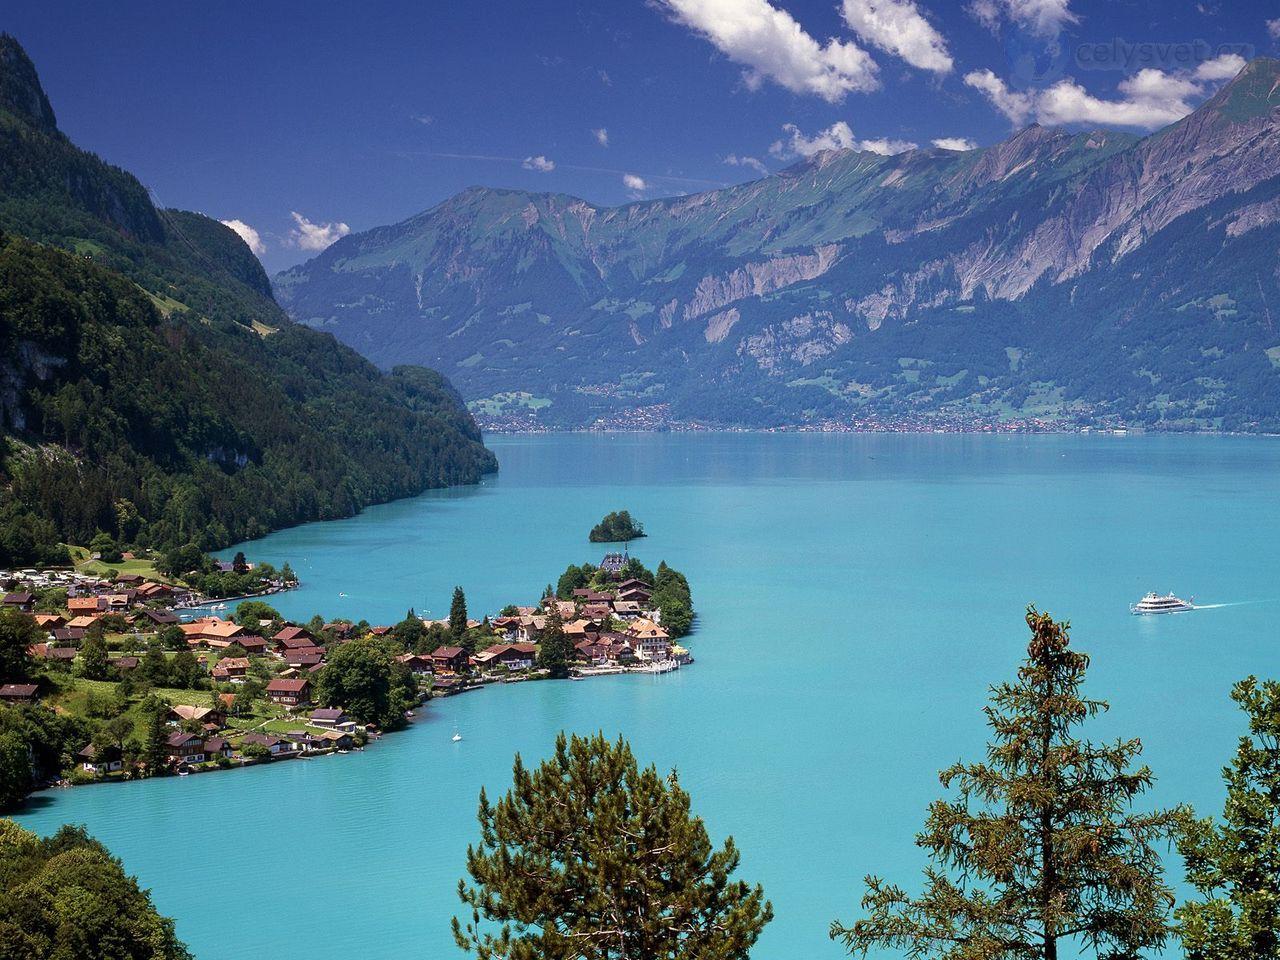 Lakes In Switzerland Iseltwald Lake Brienz Iseltwald Switzerland Places